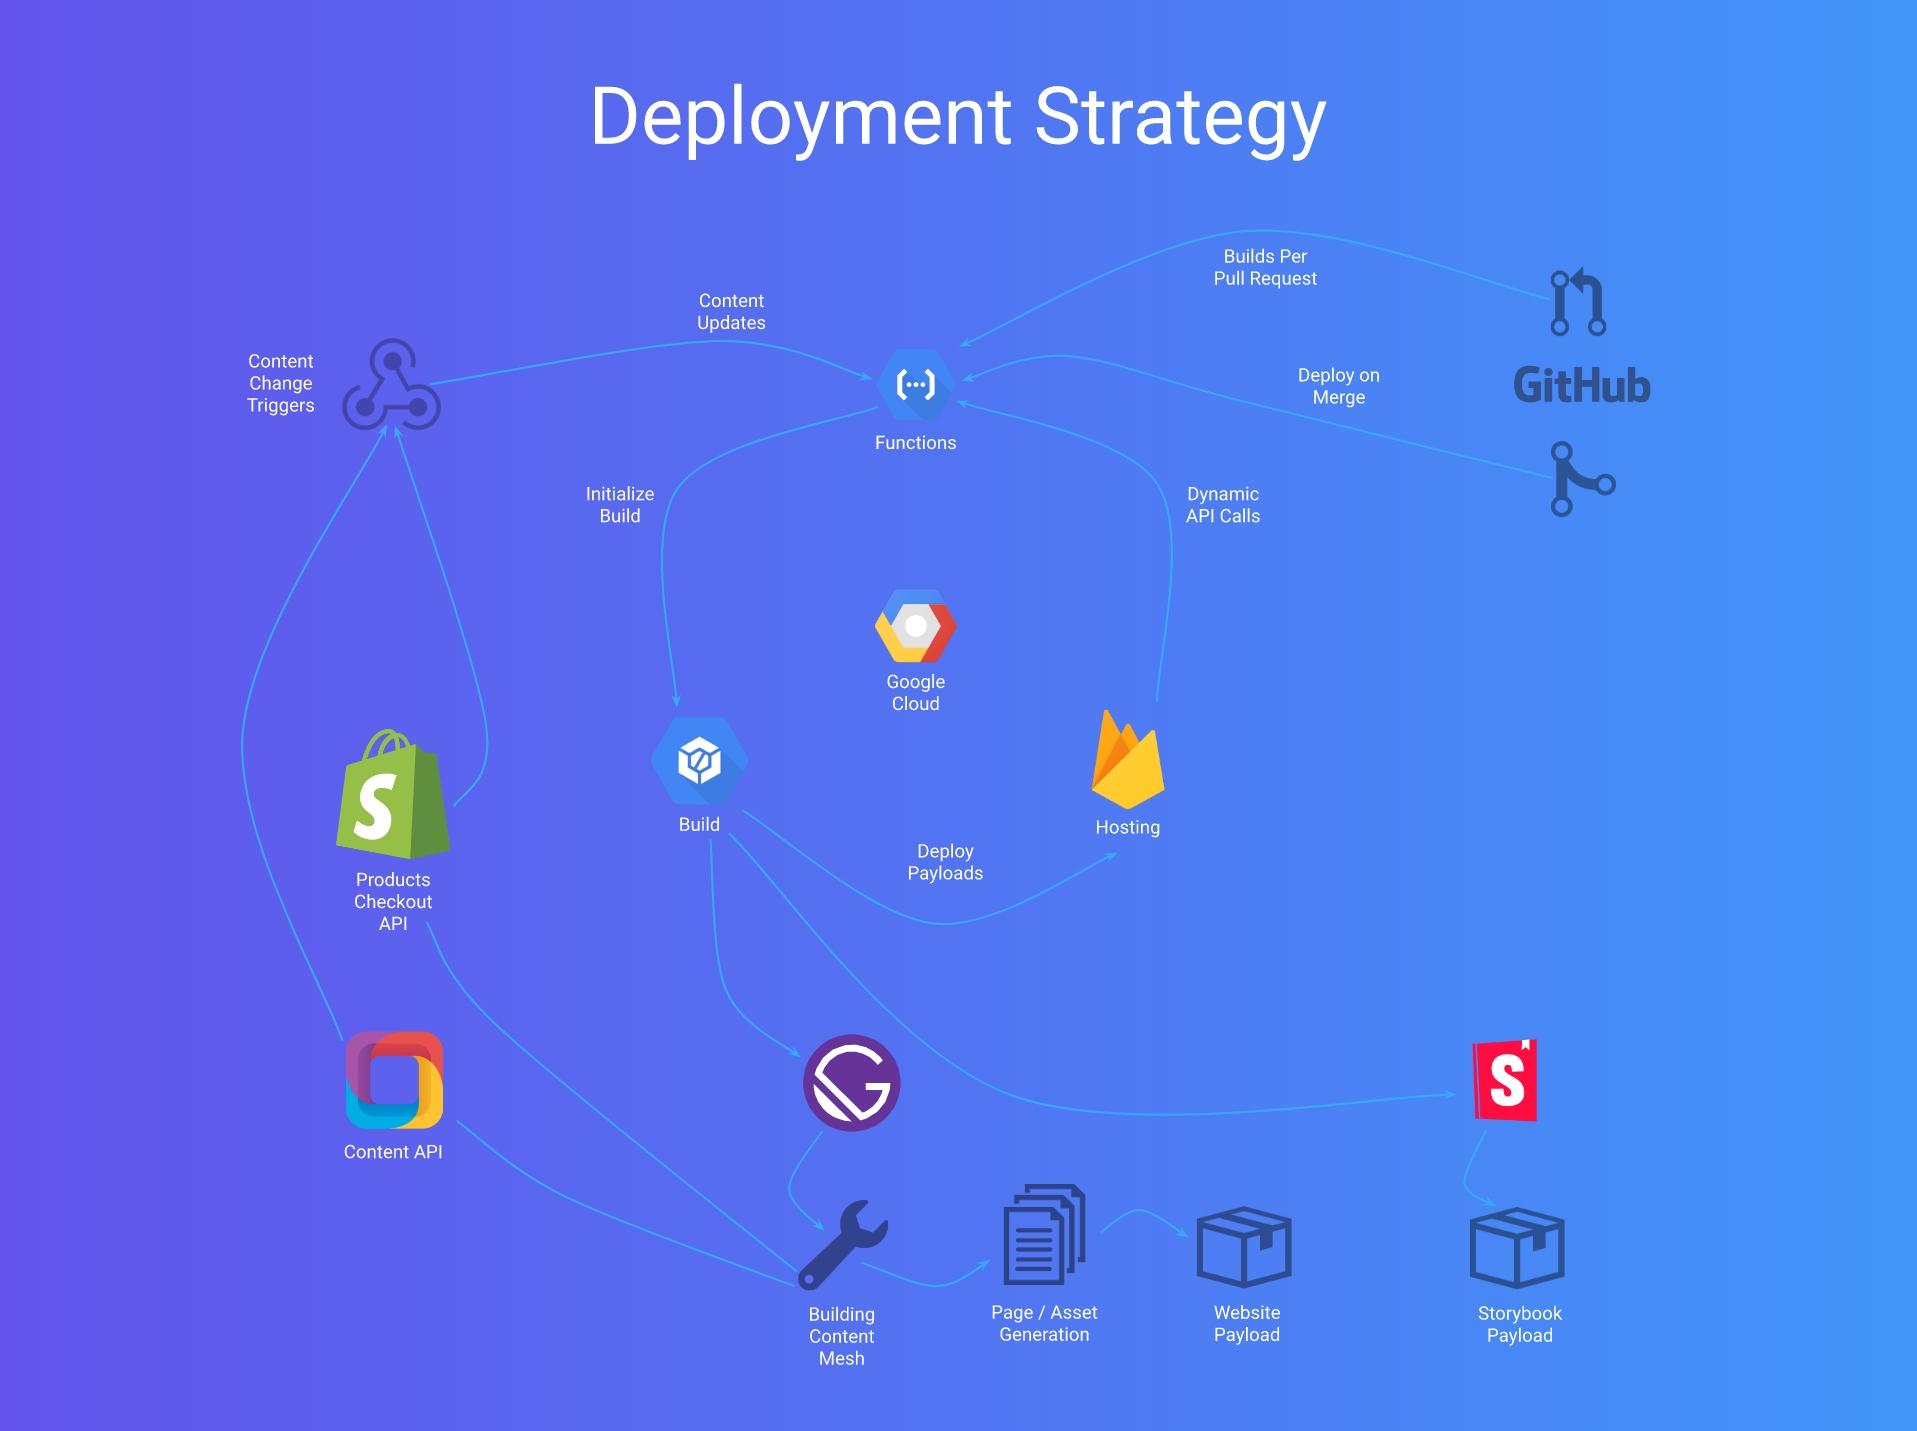 Strivectin deployment strategy